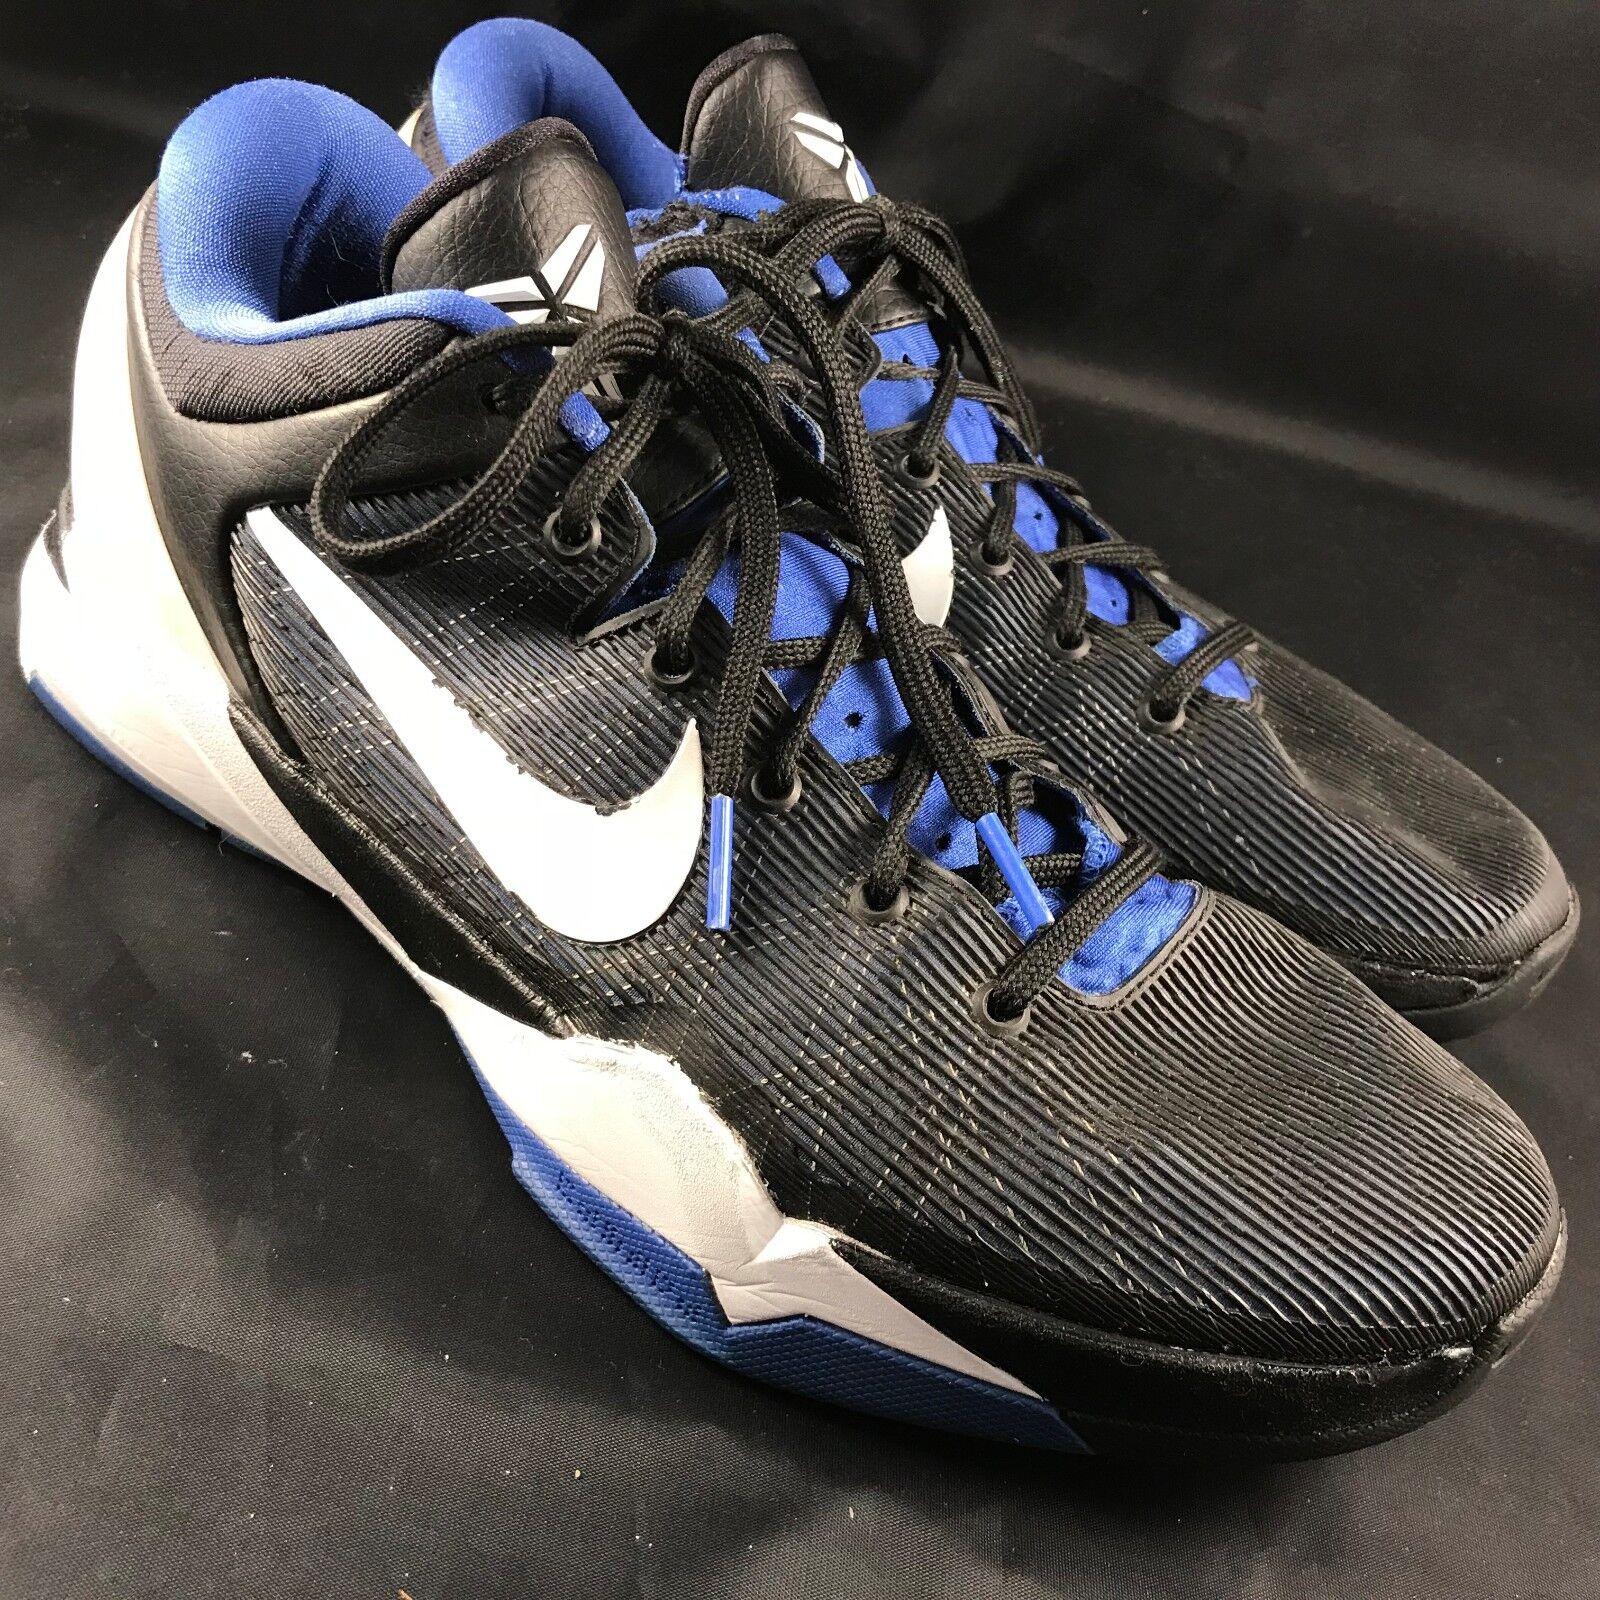 RARE� Nike Zoom Kobe 7 VII Treasure Blue Black Dukes Sz 11.5 45.5 488371-400